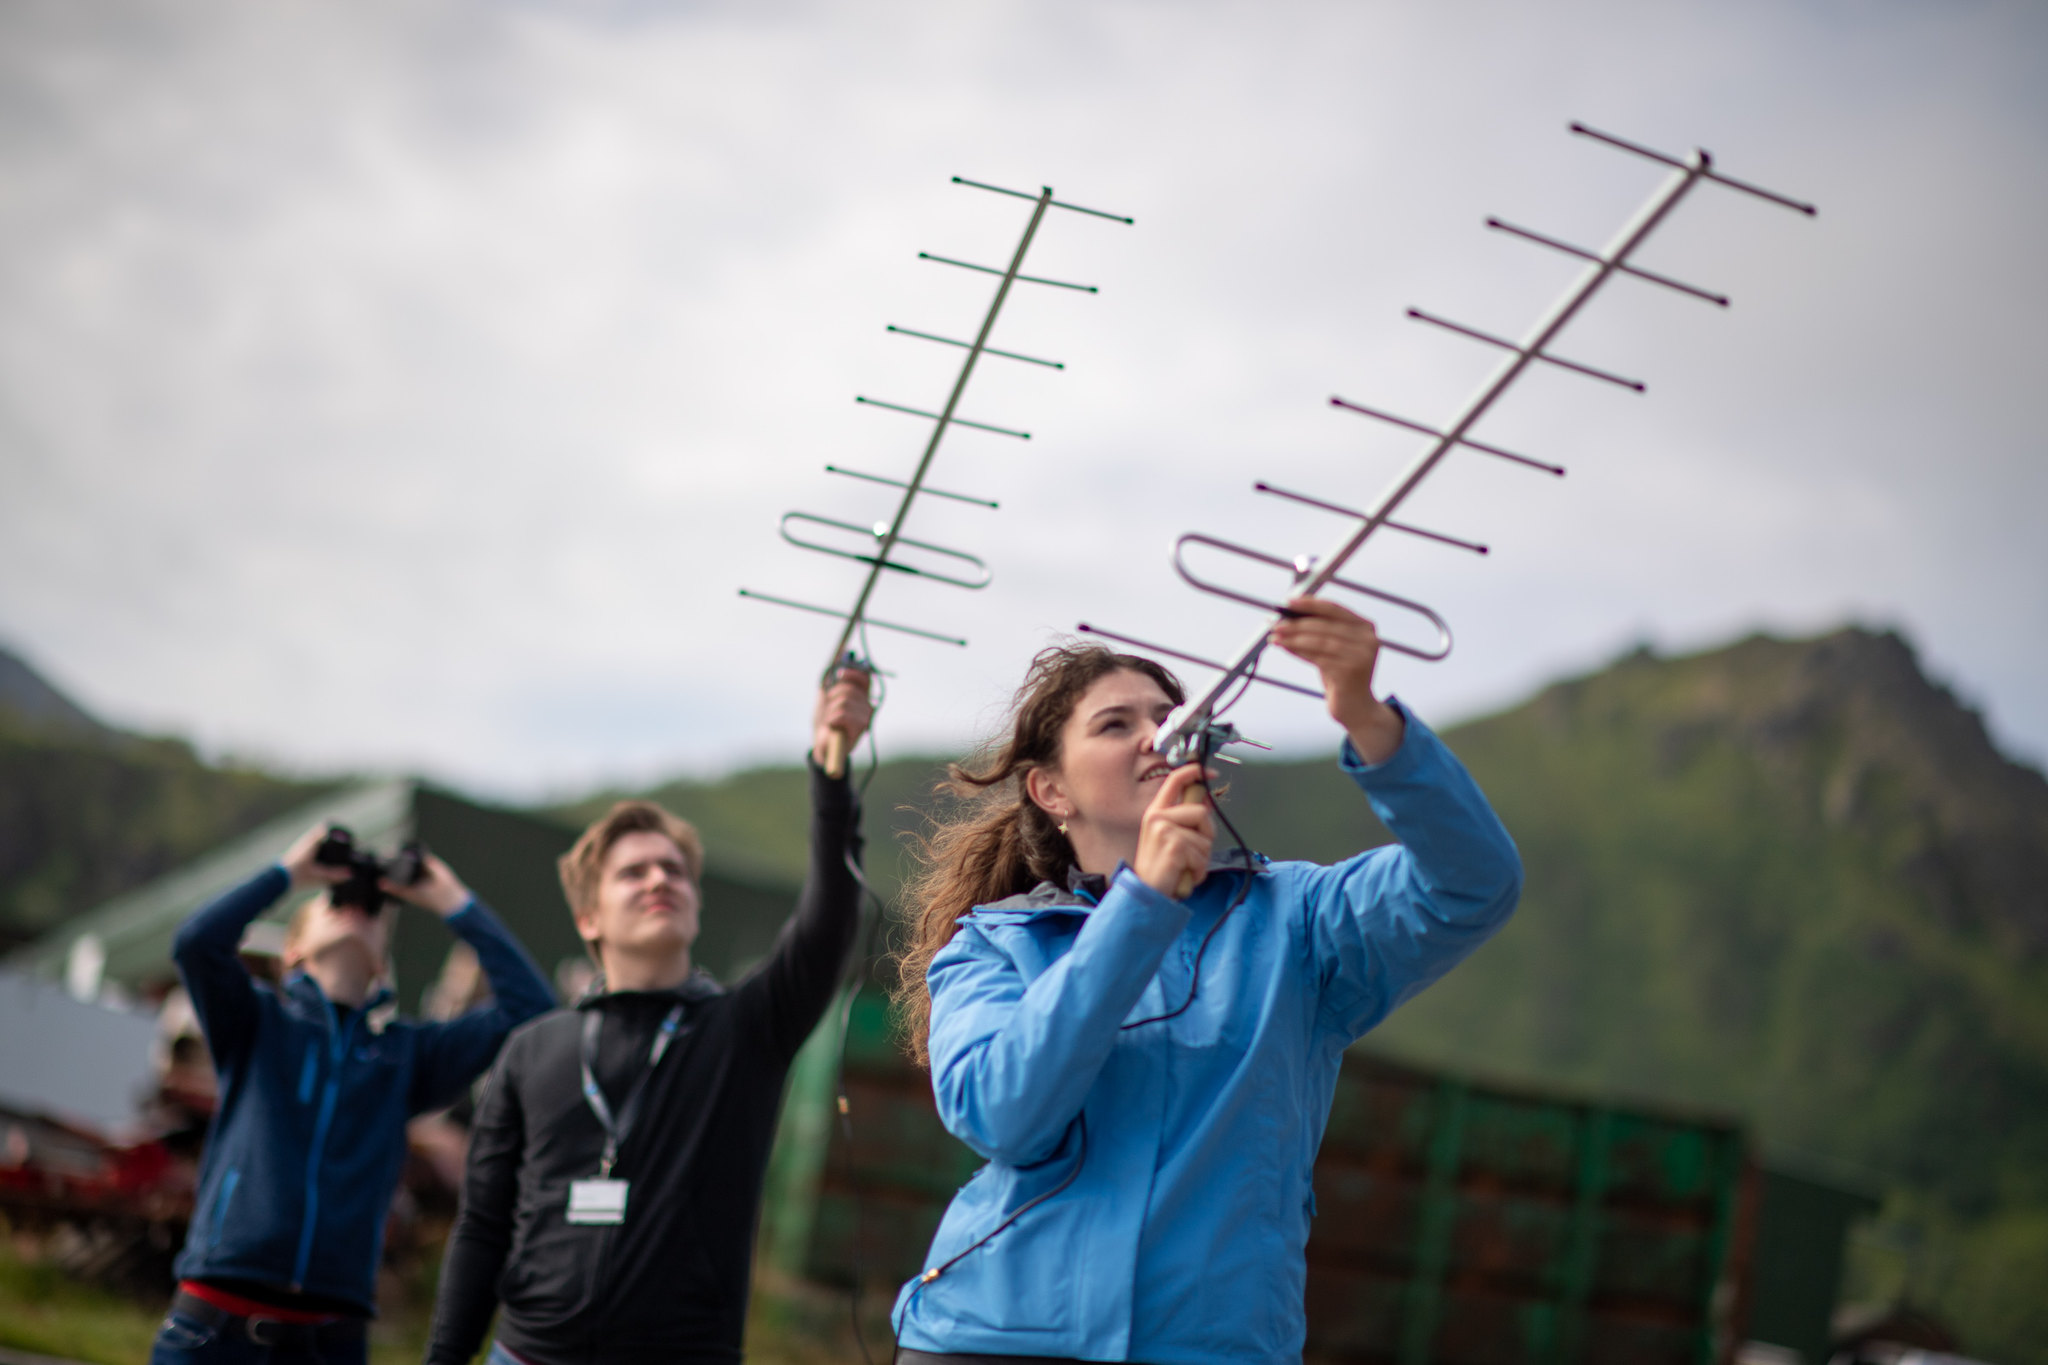 Studenter ved Andøya Space sin sommer camp søker etter data fra sin CanSat. Foto: Andøya Space Education.